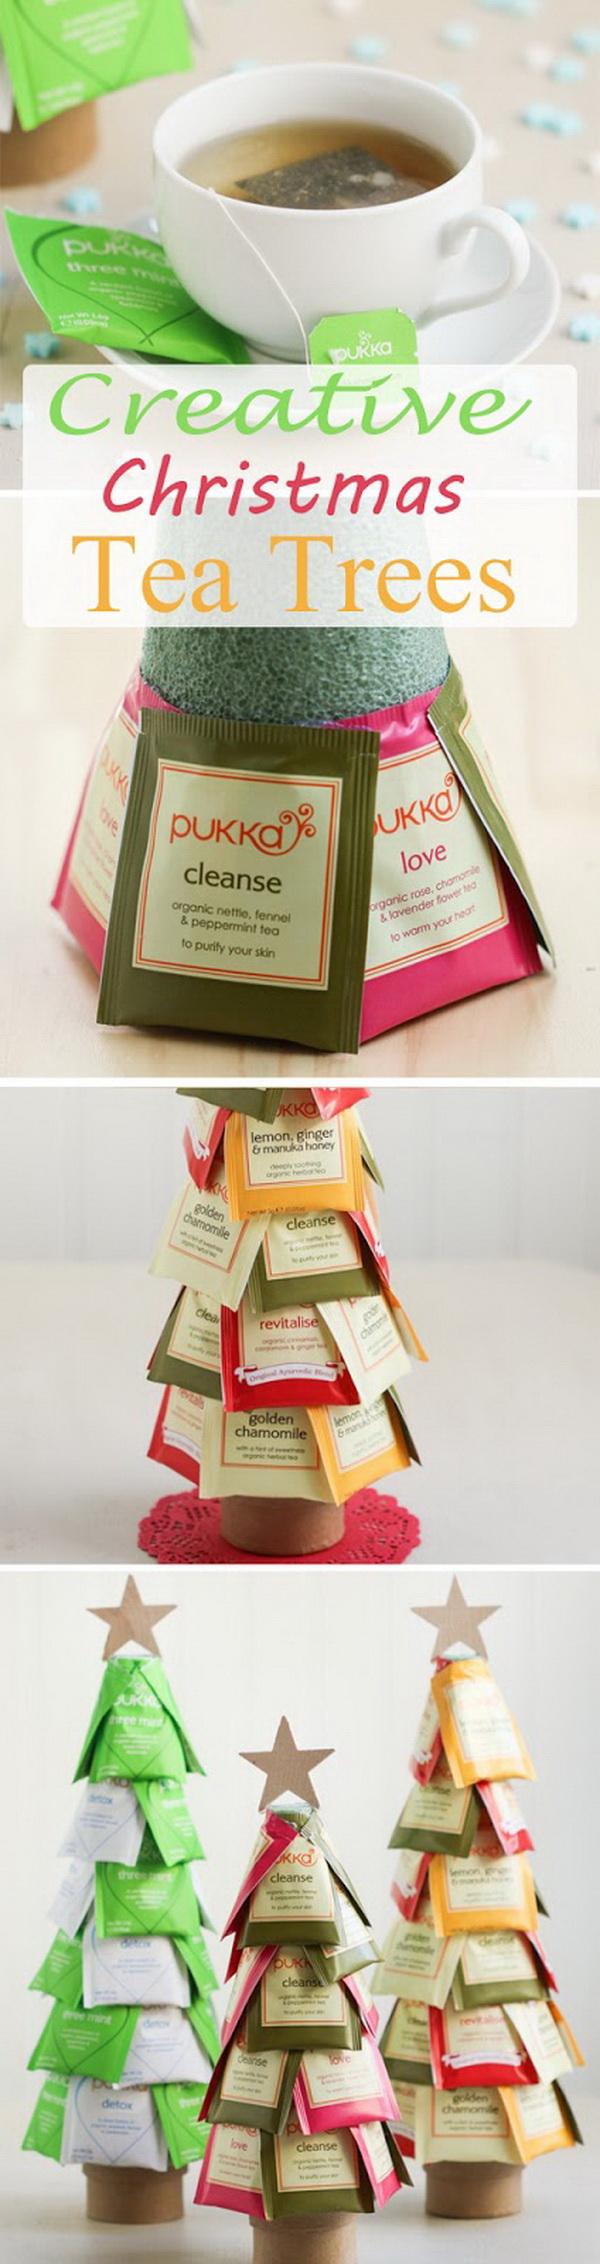 Creative Christmas Tea Trees. This Christmas tee tree makes a super sweet and easy handmade & 30+ Homemade Christmas Gifts Everyone will Love - For Creative Juice